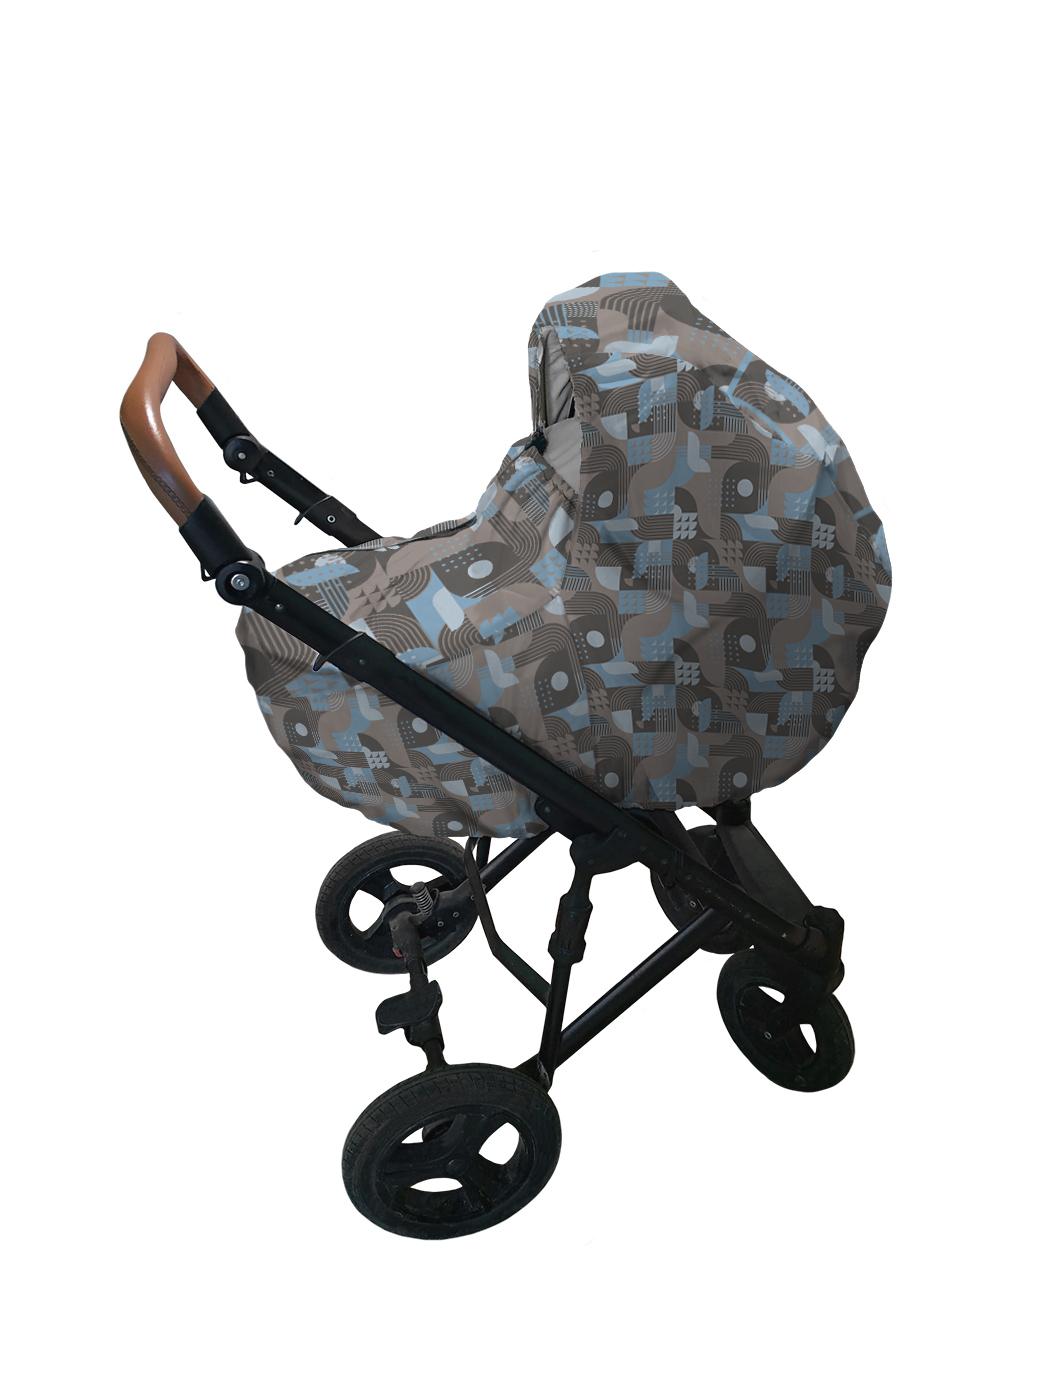 Чехол дождевик на коляску Геометрический дизайн sfer.tex